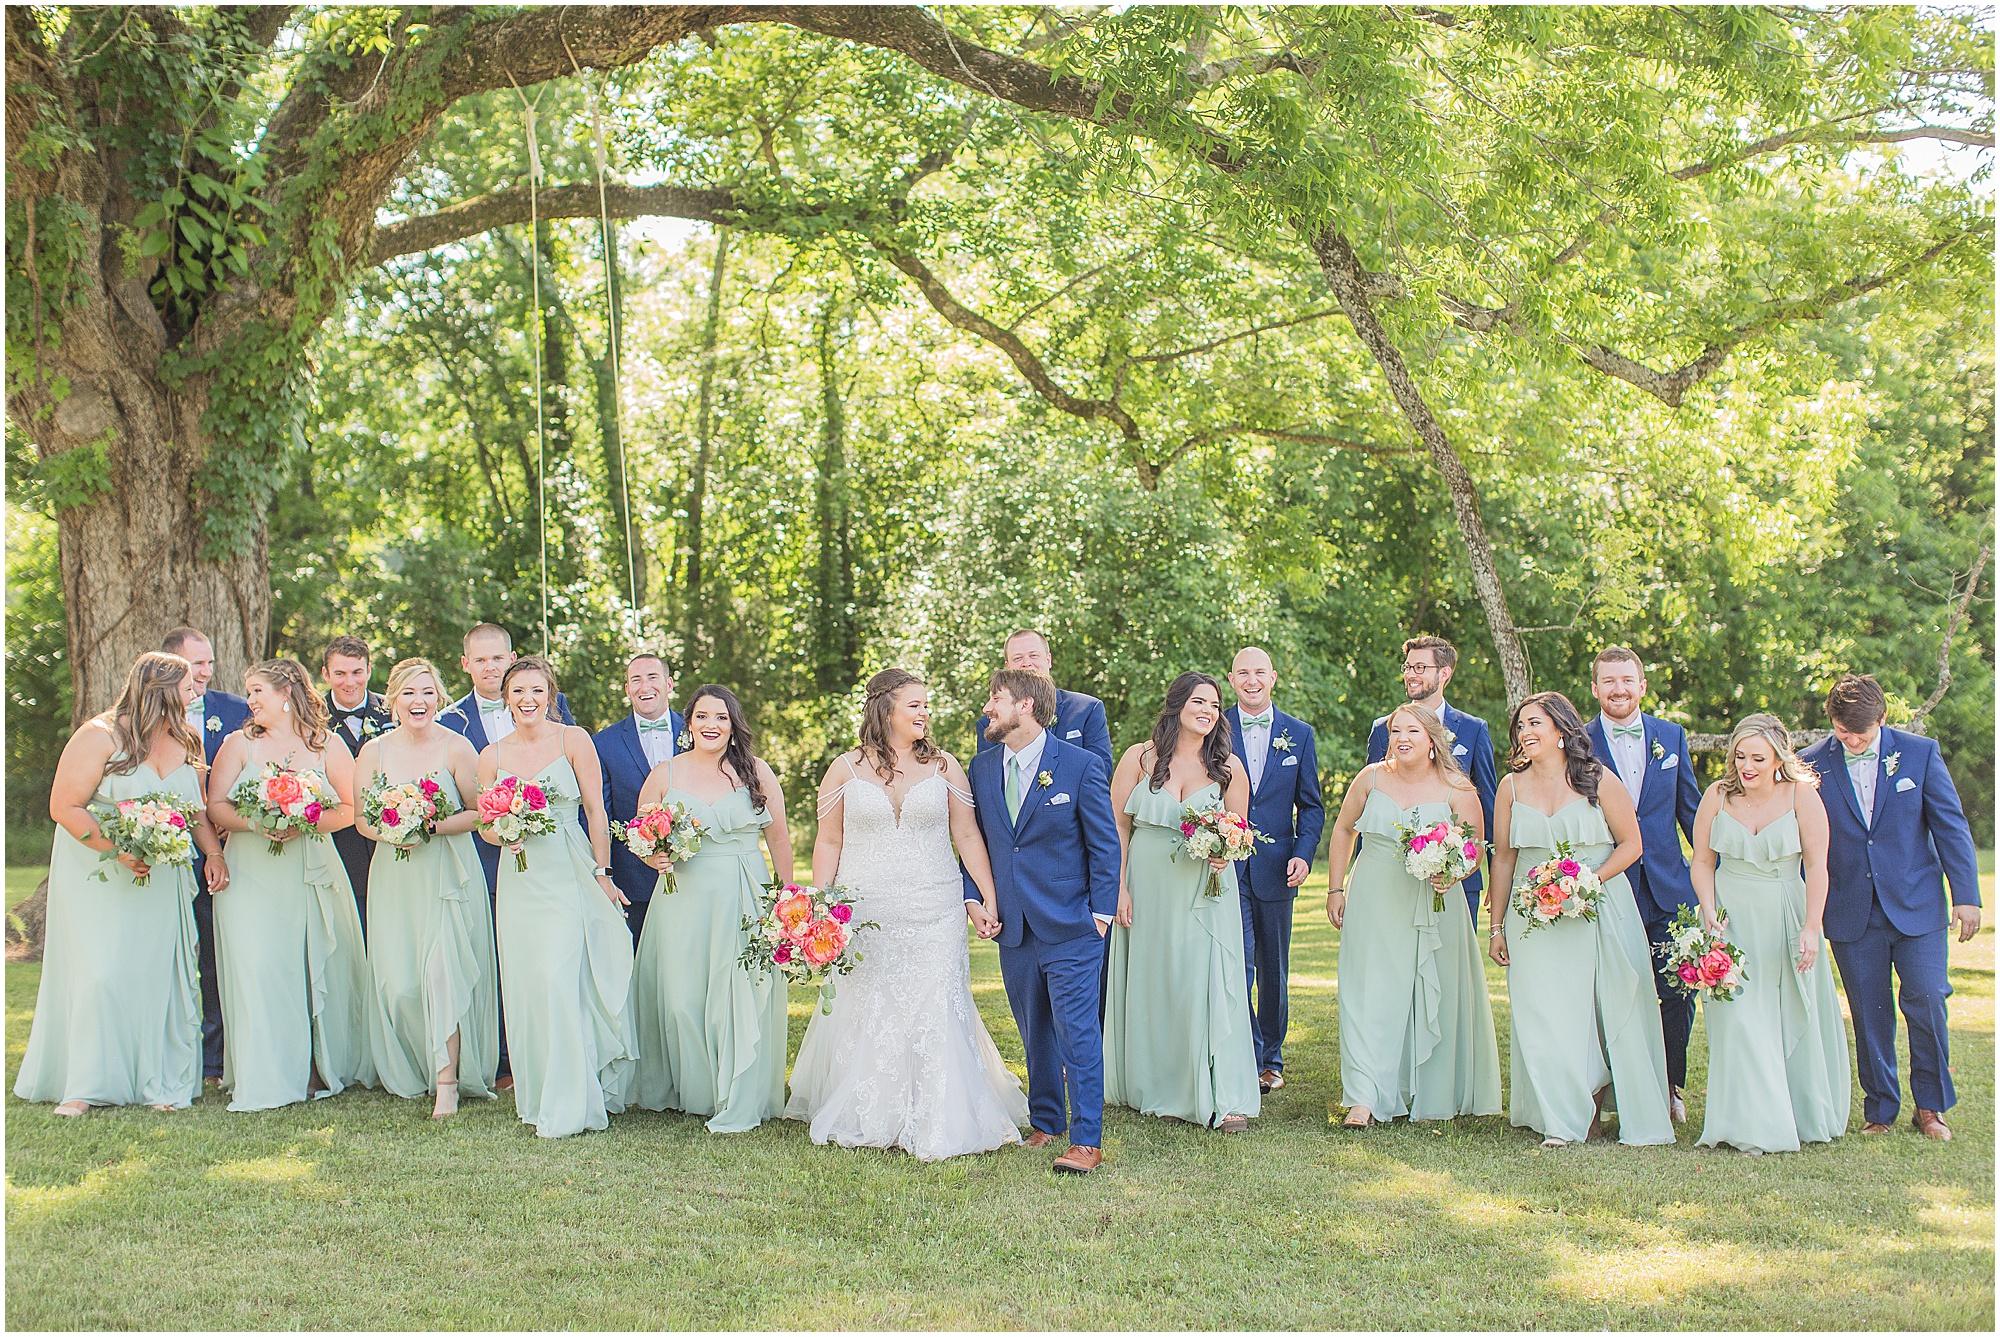 starkville-mississippi-wedding-page-place-dodson-farms_0050.jpg